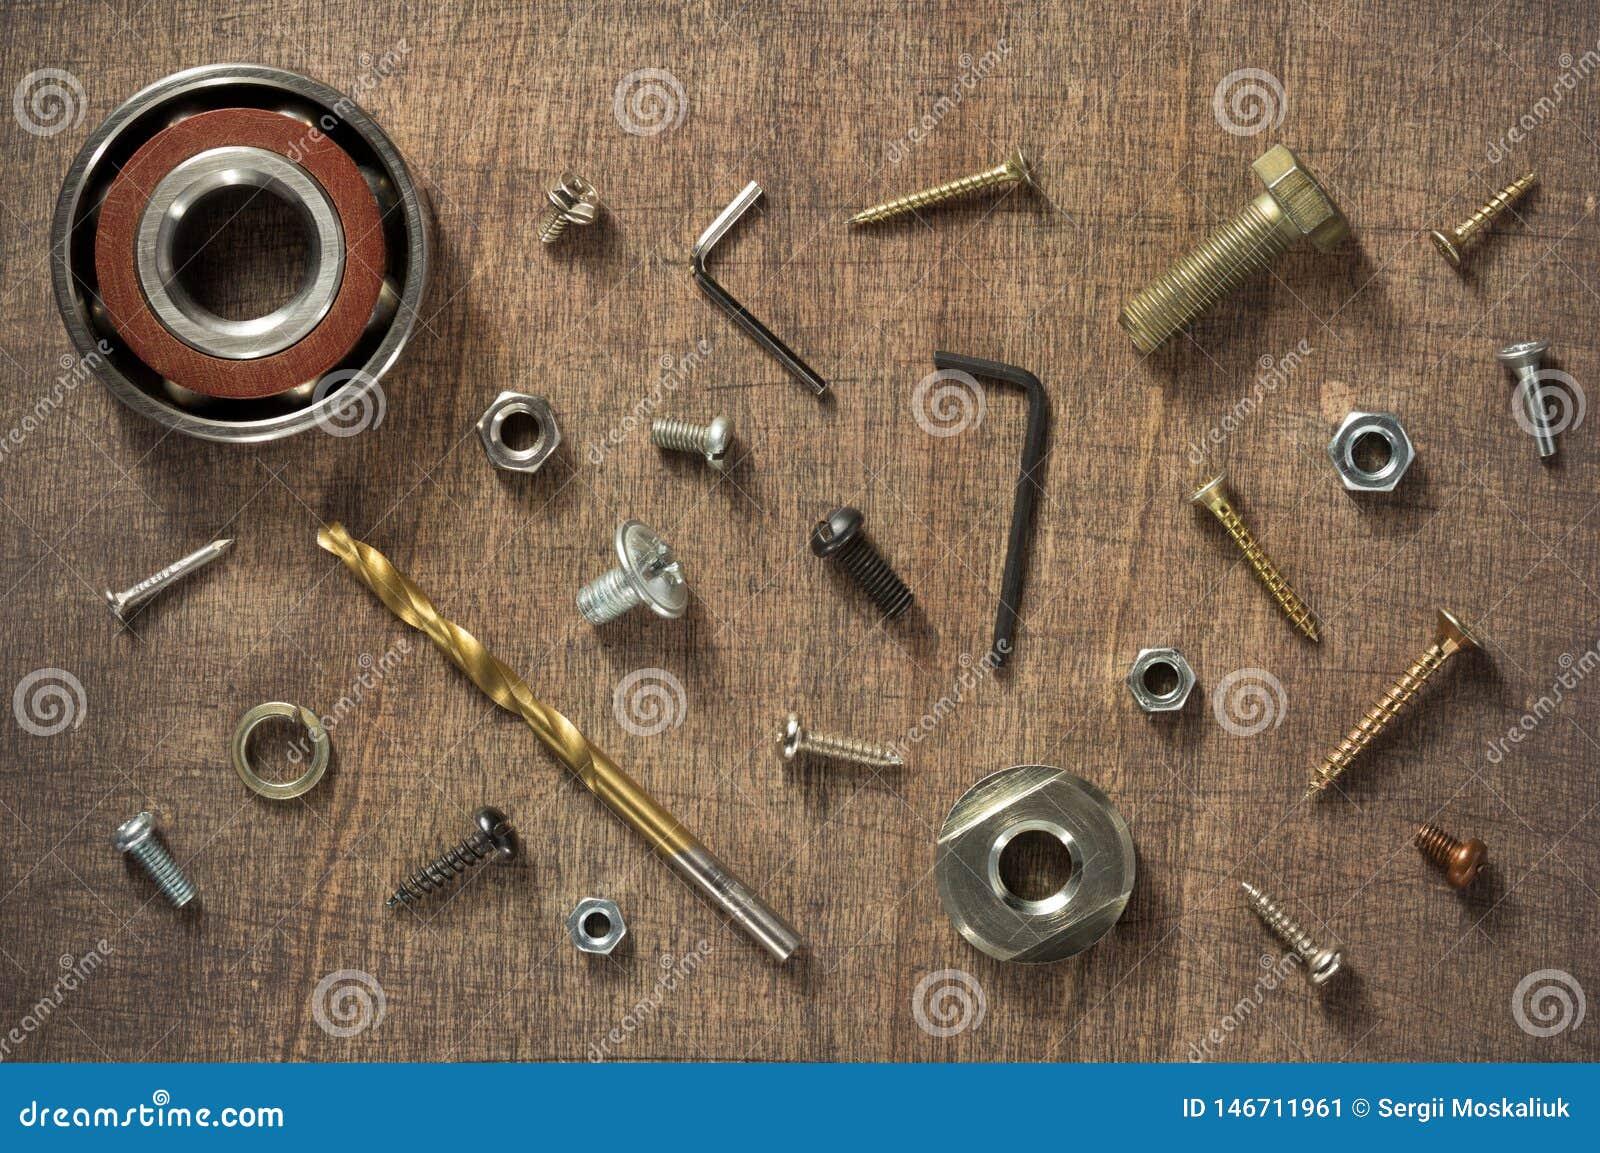 Hardware tools and screws at wood